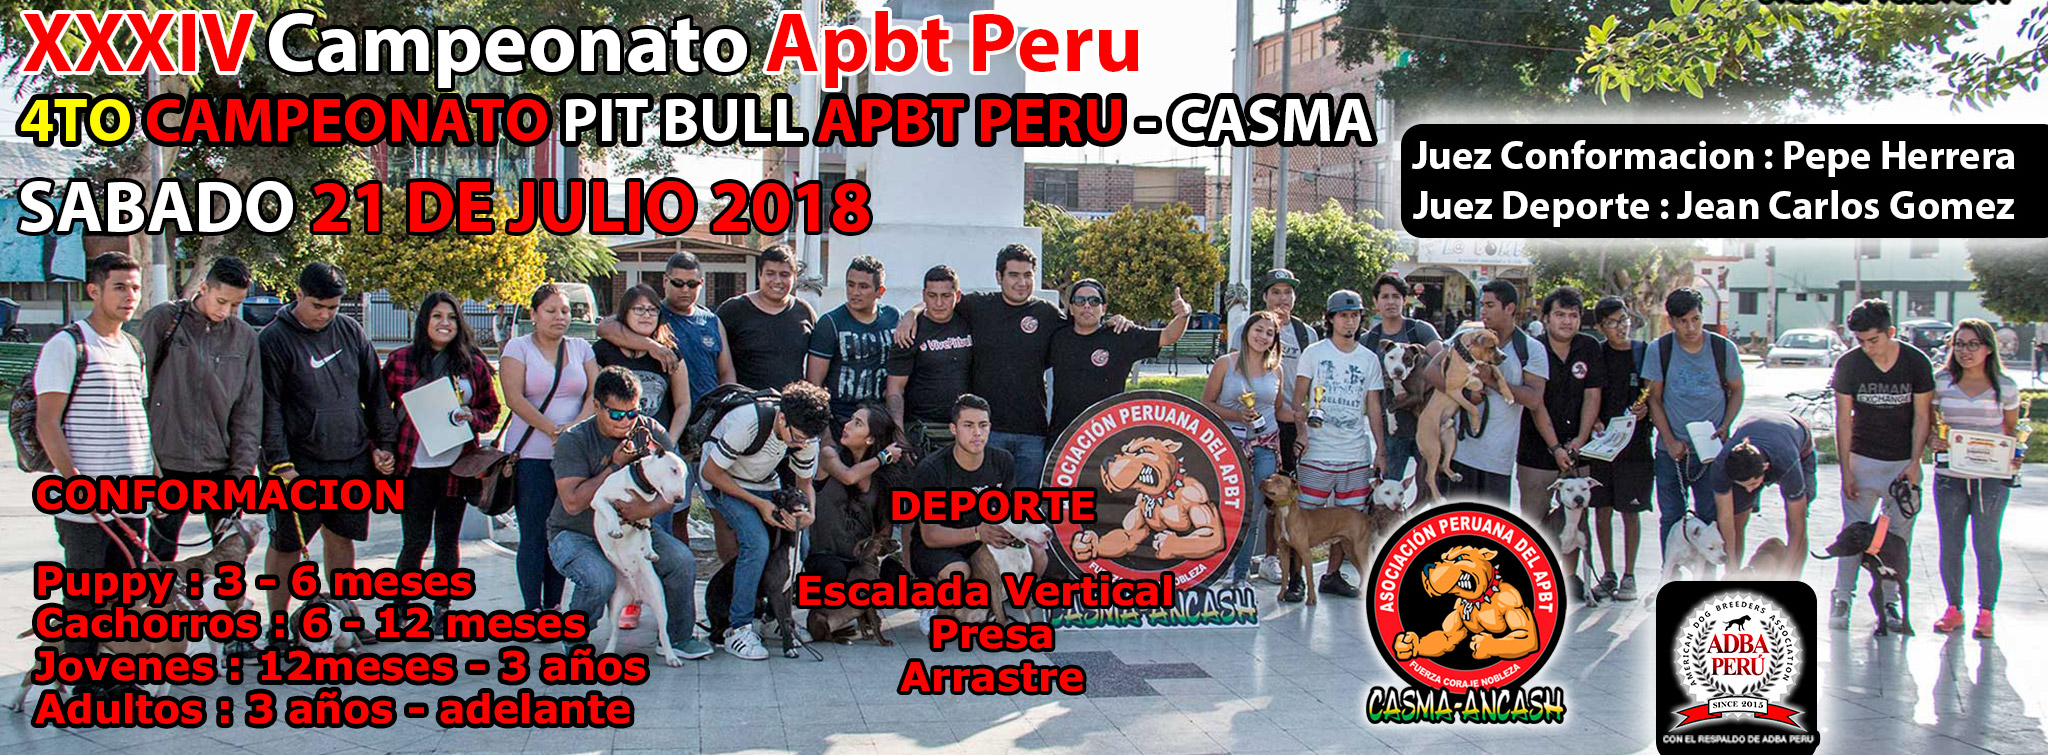 XXXIV Campeonato Apbt Peru – 4to Campeonato Apbt Peru Casma